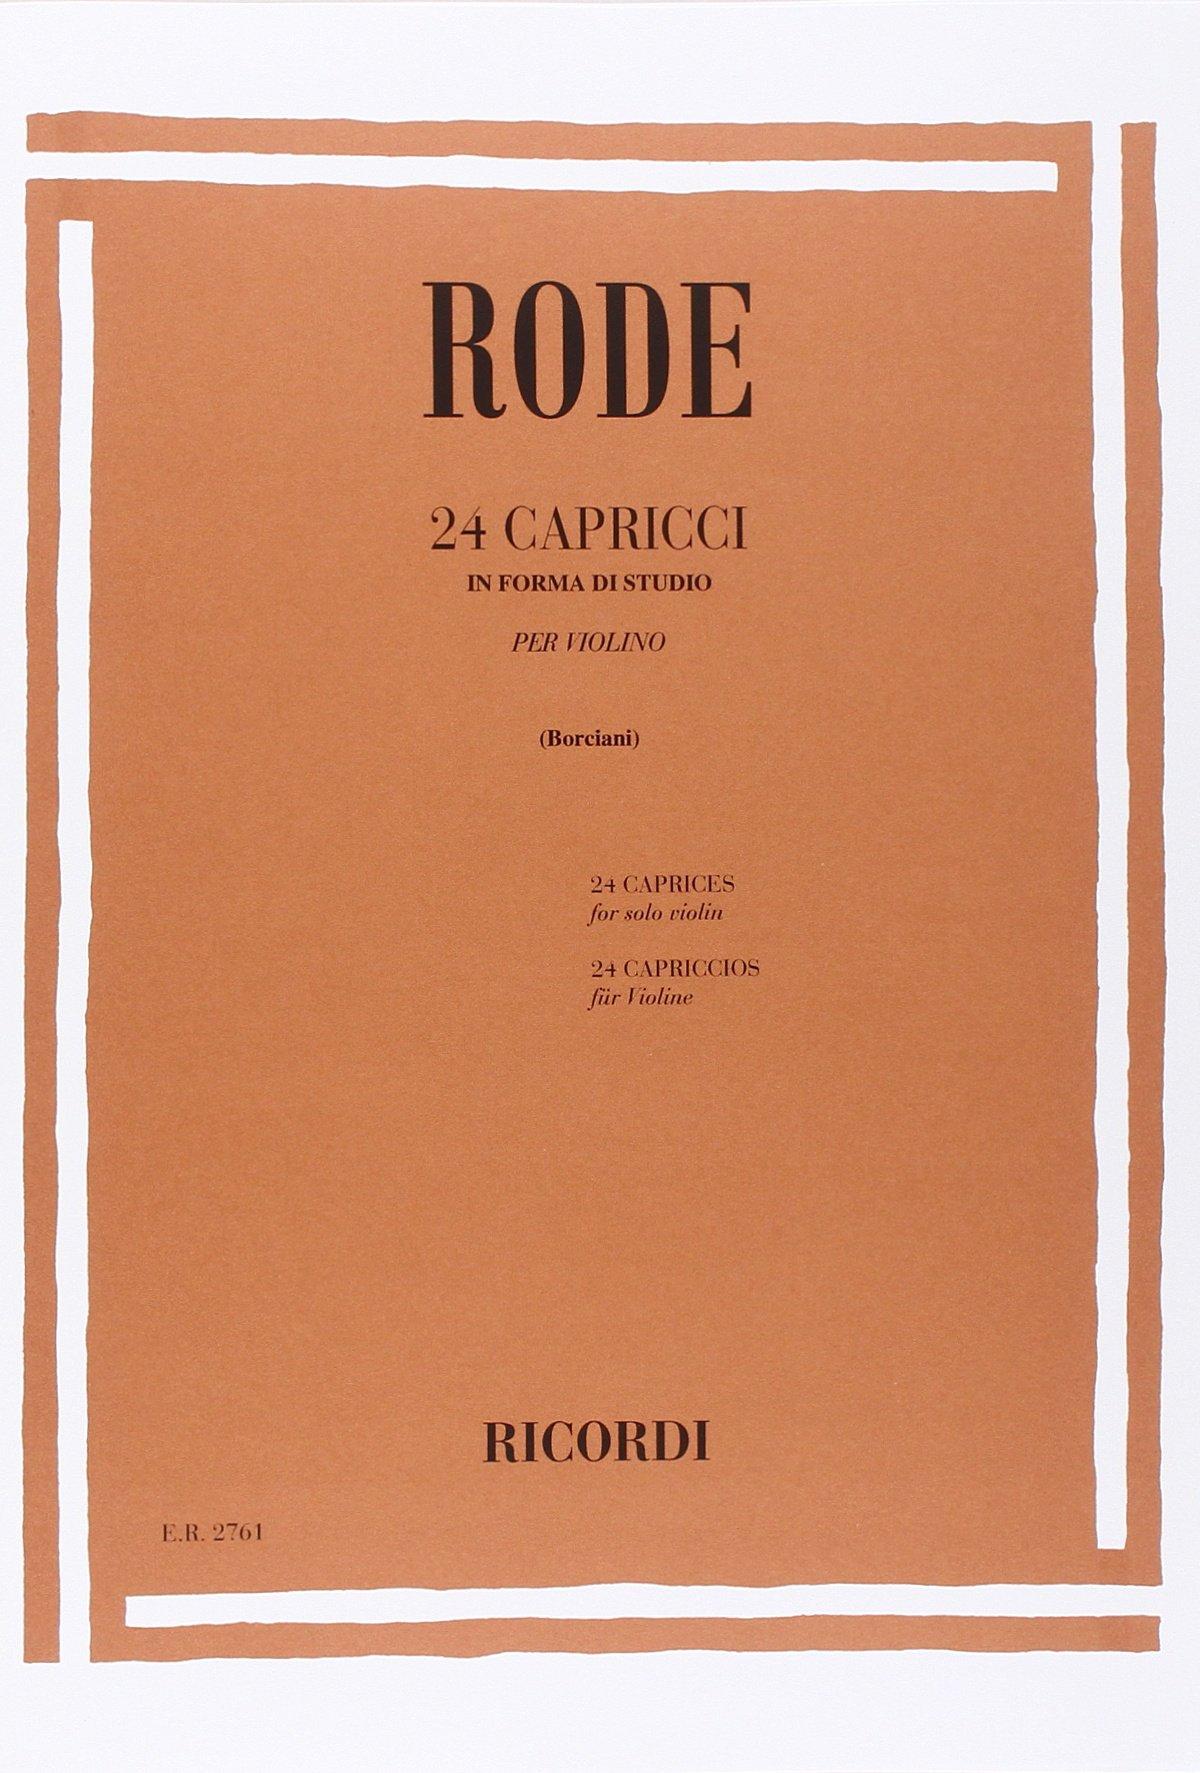 24 CAPRICCI IN FORMA DI STUDIO (Francese) Copertina flessibile – 1 dic 1976 RODE J.P. Ricordi 0041827619 Musique